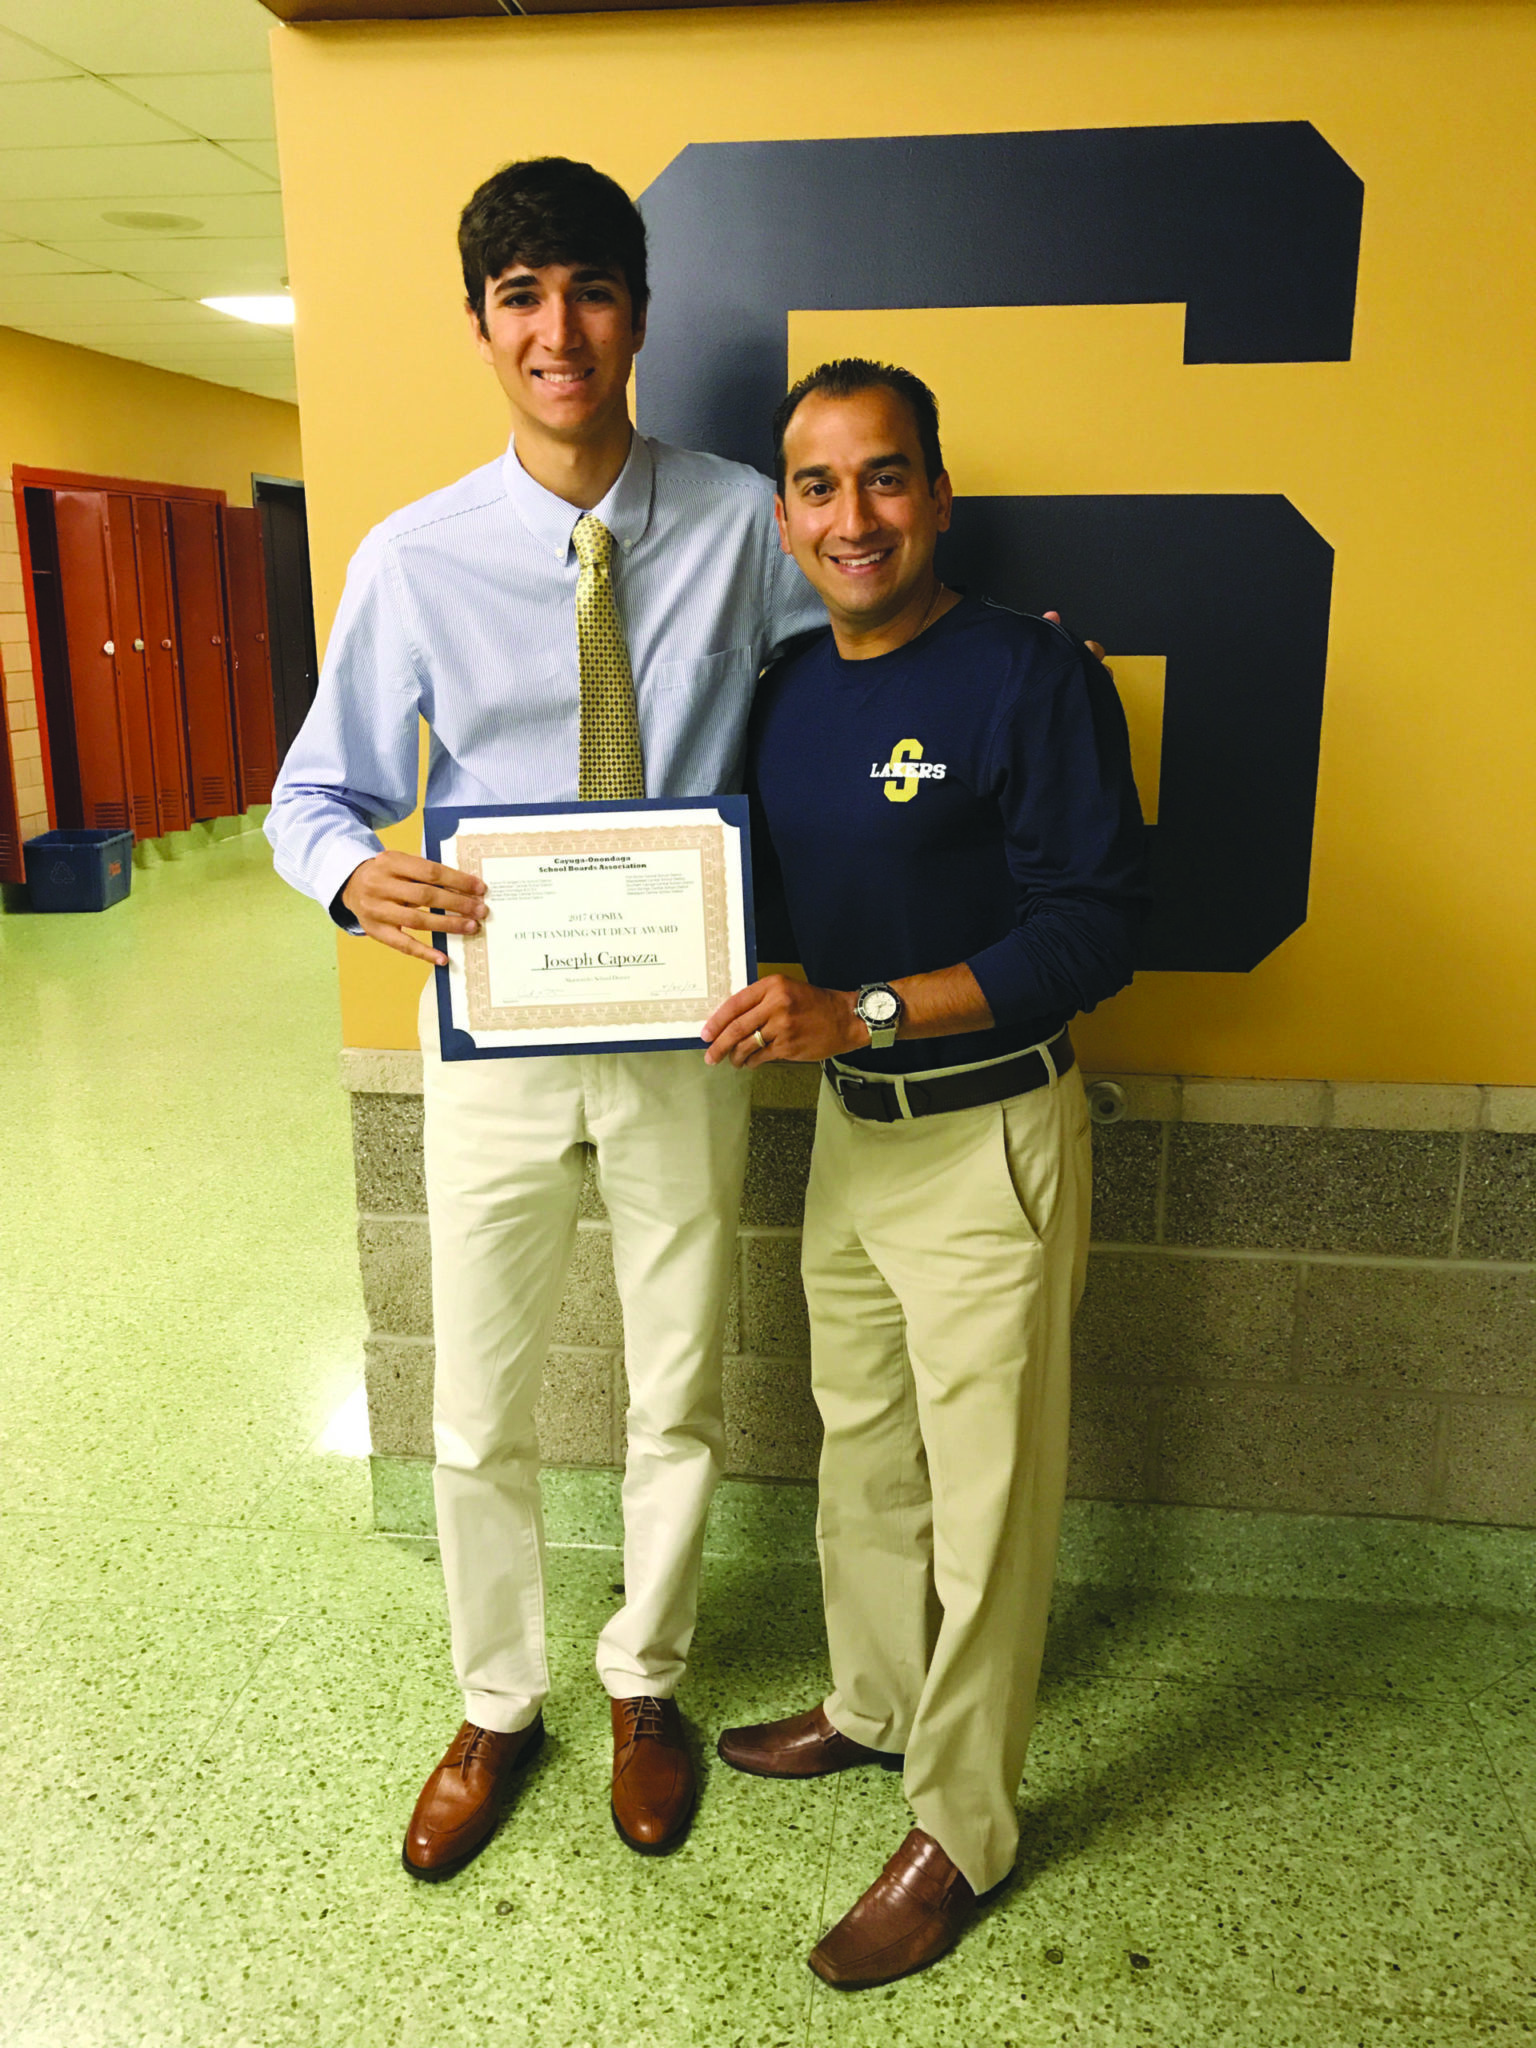 Capozza wins award